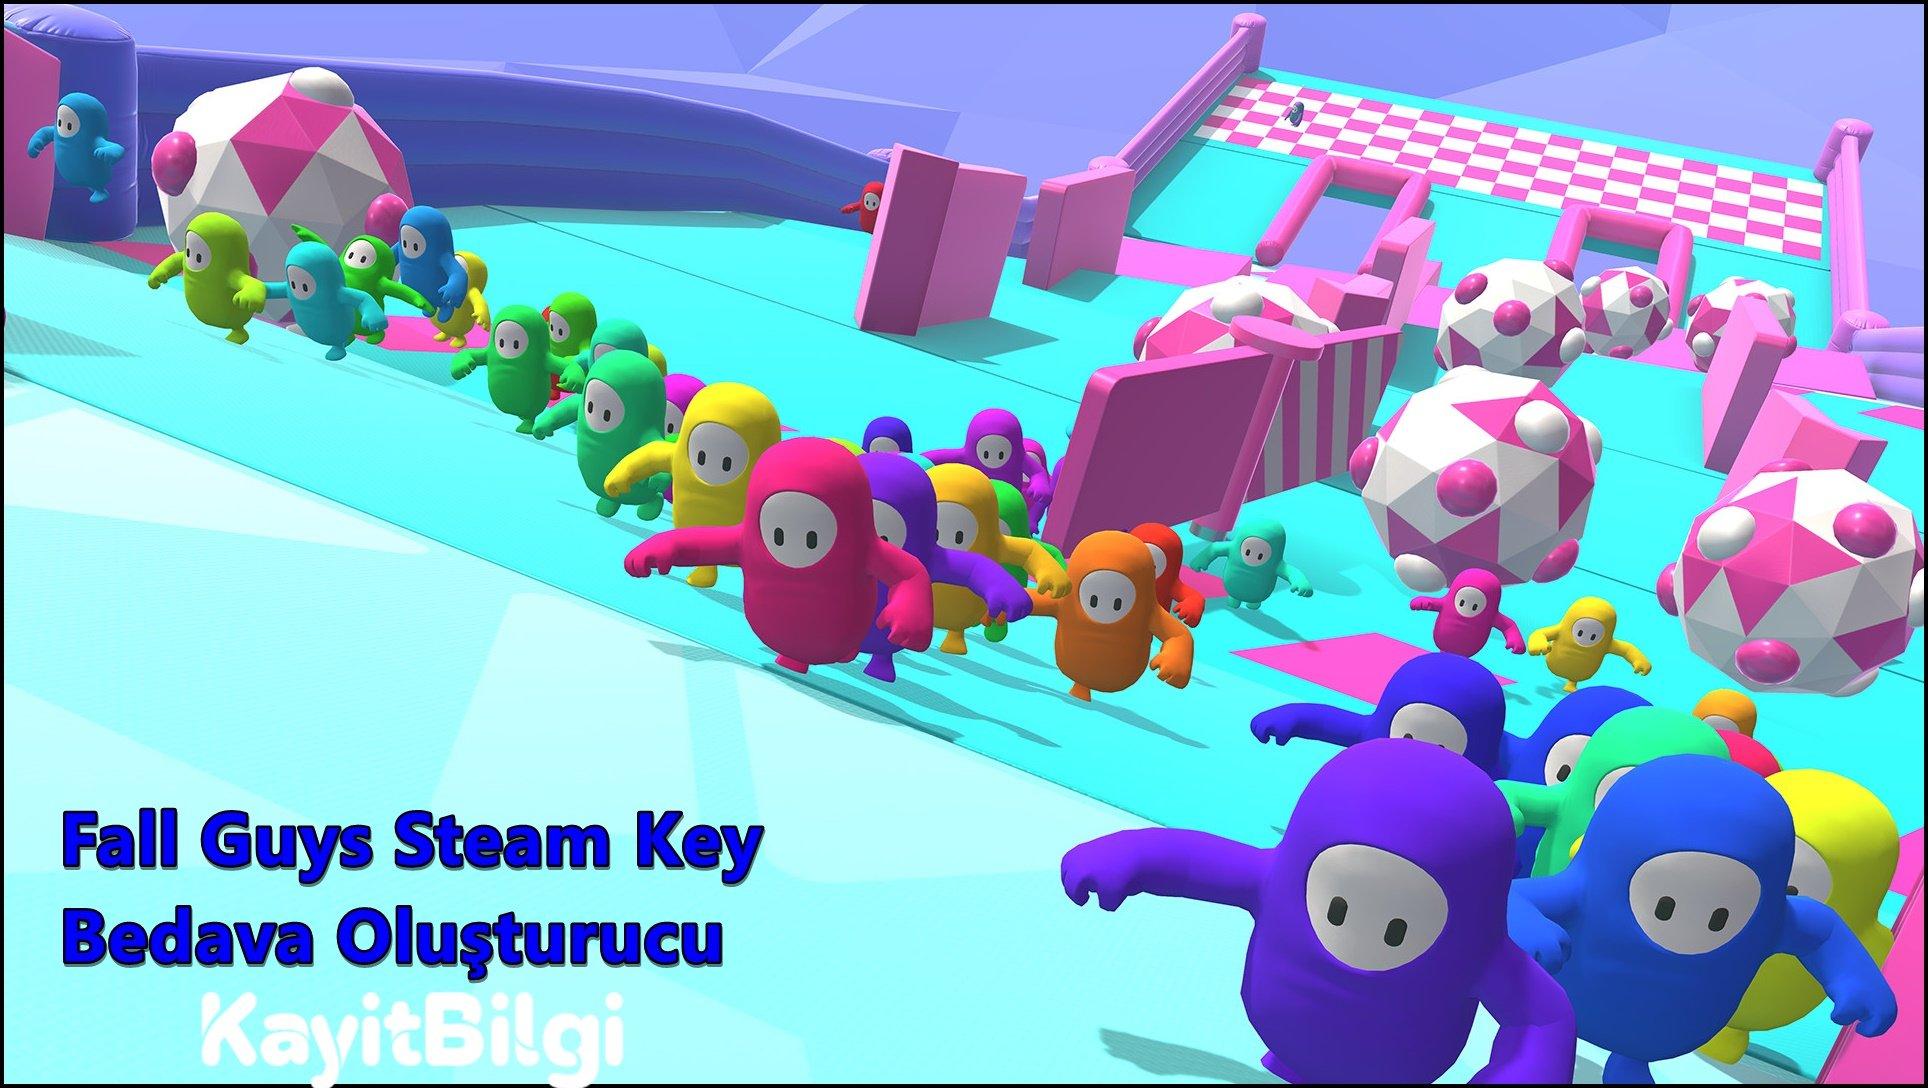 Fall Guys Steam Key Bedava